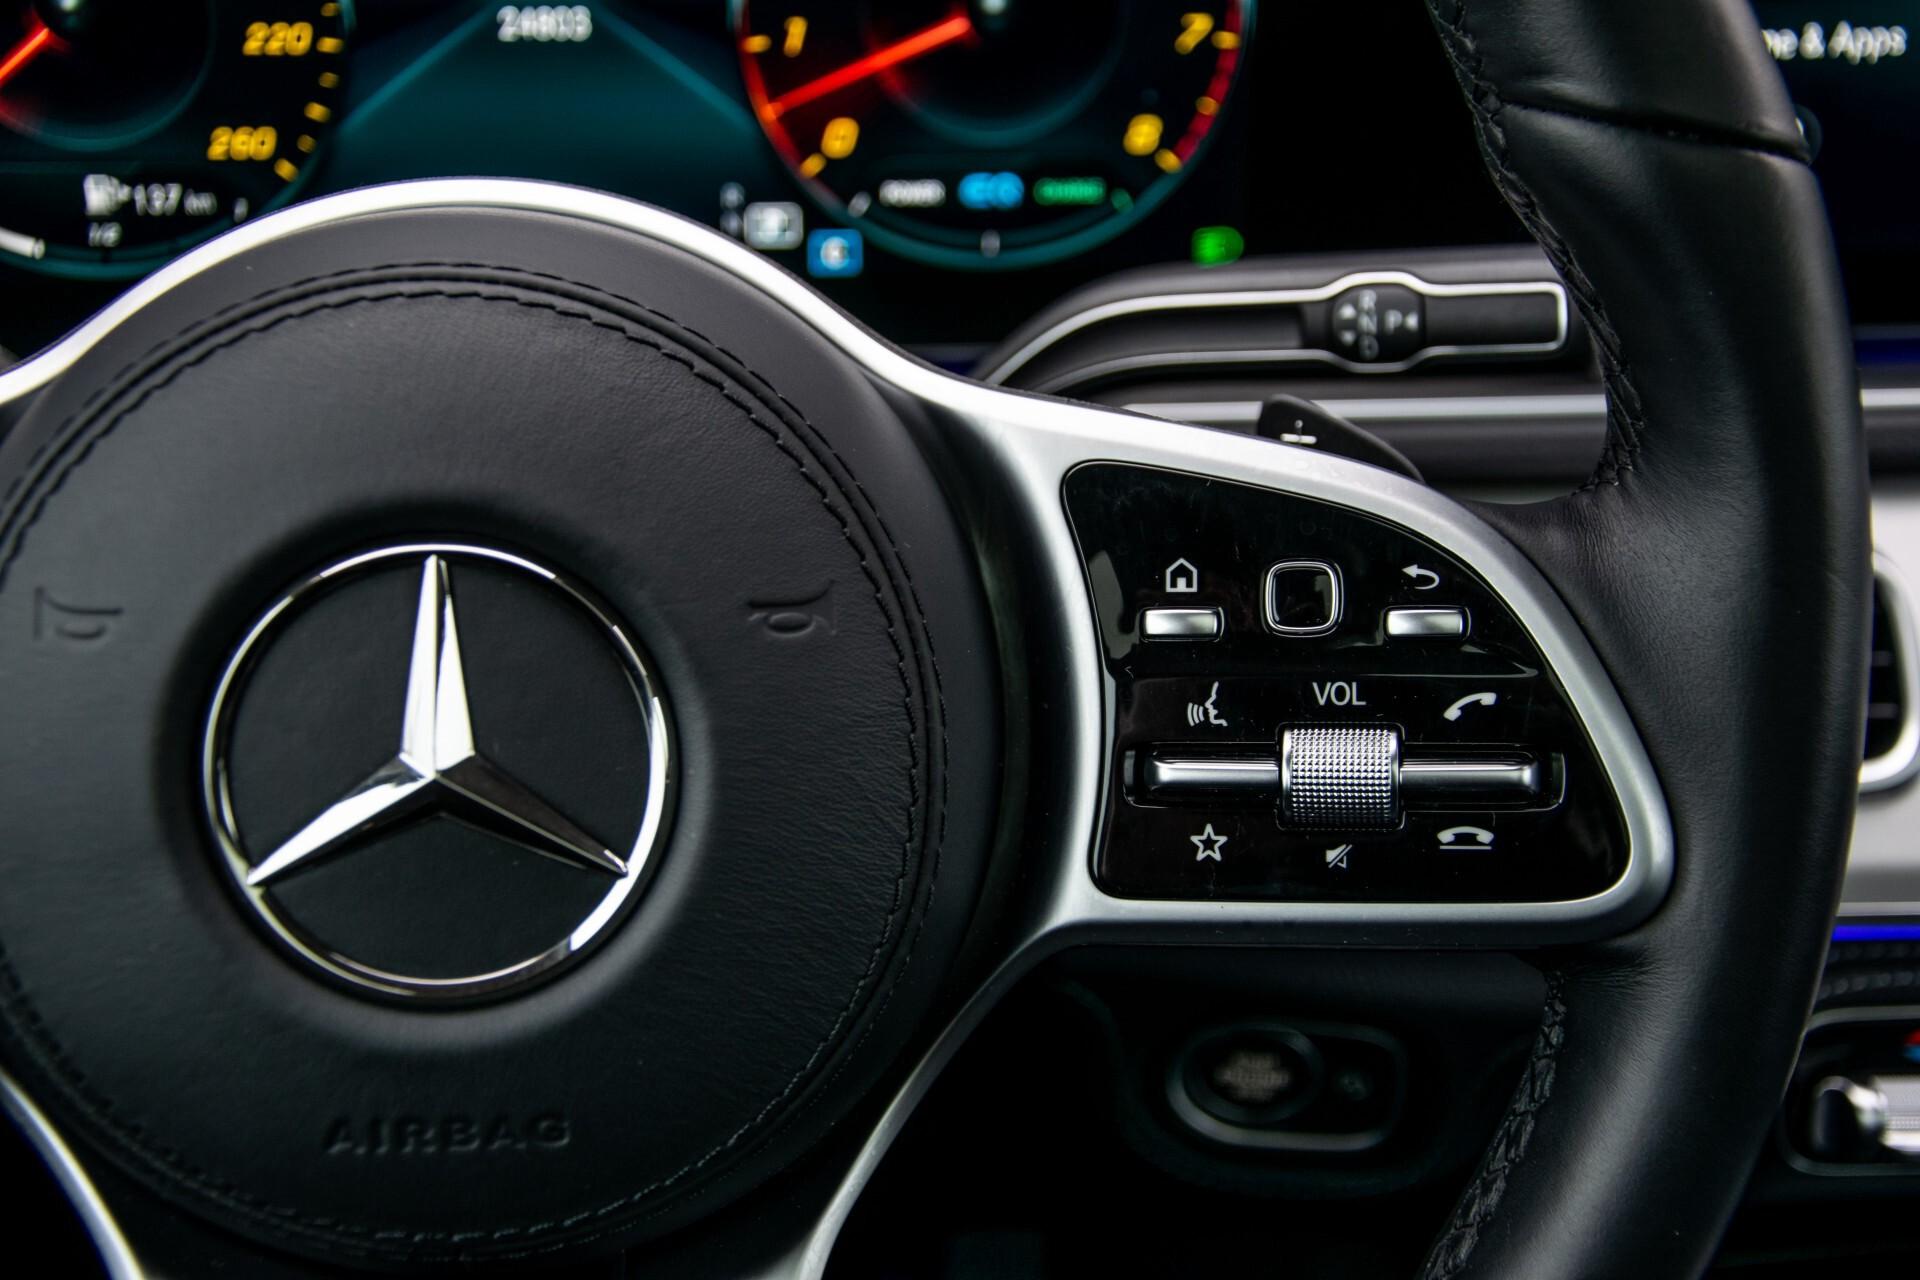 Mercedes-Benz GLE 450 4-M 7-Persoons AMG Massage/Rij-assist/Keyless/TV/360/Night/Trekhaak Aut9 Foto 17